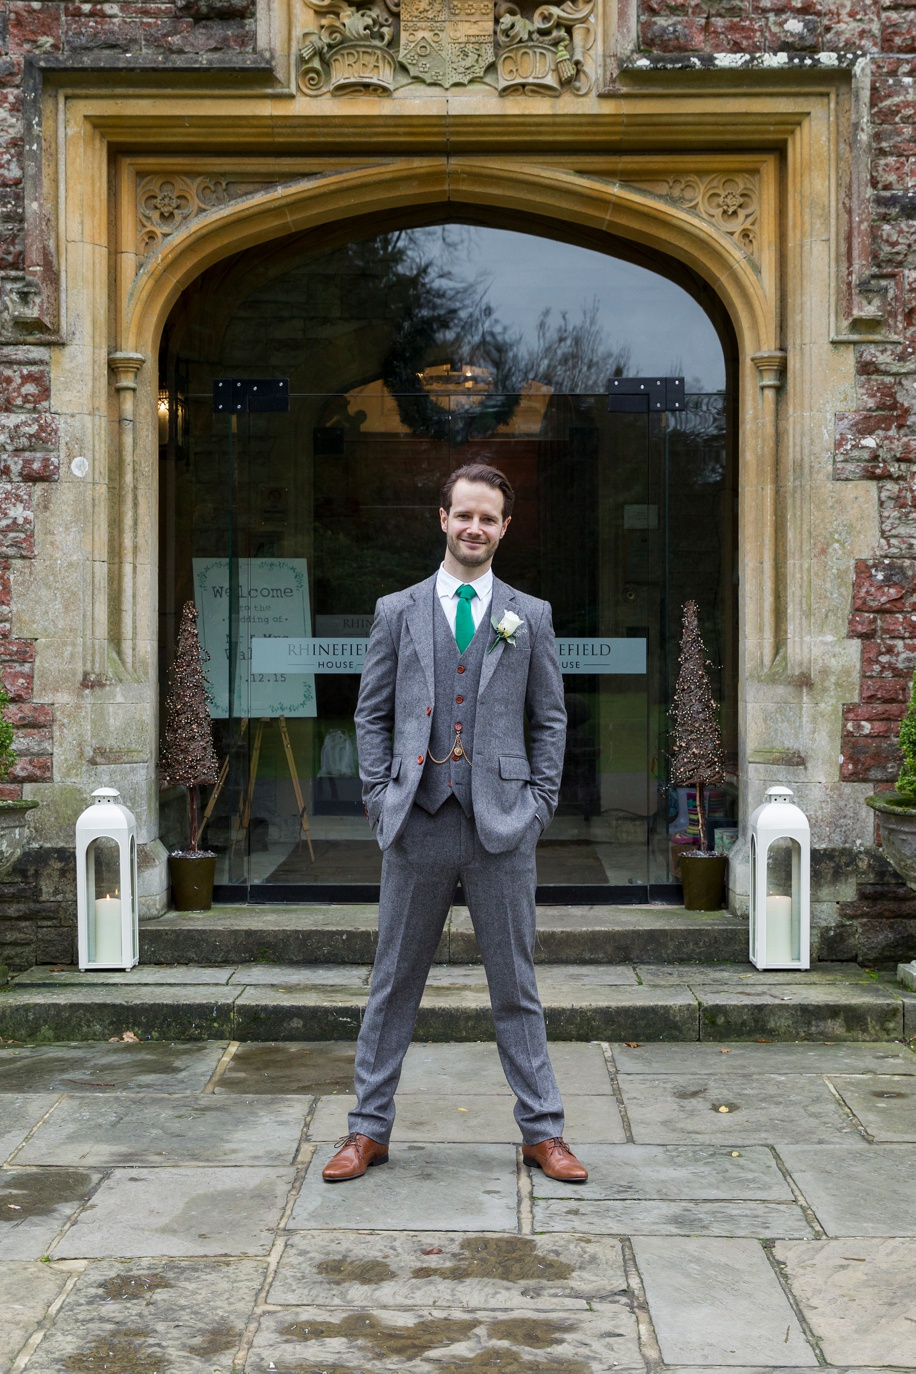 Rhinefield House wedding photography - Groom portrait